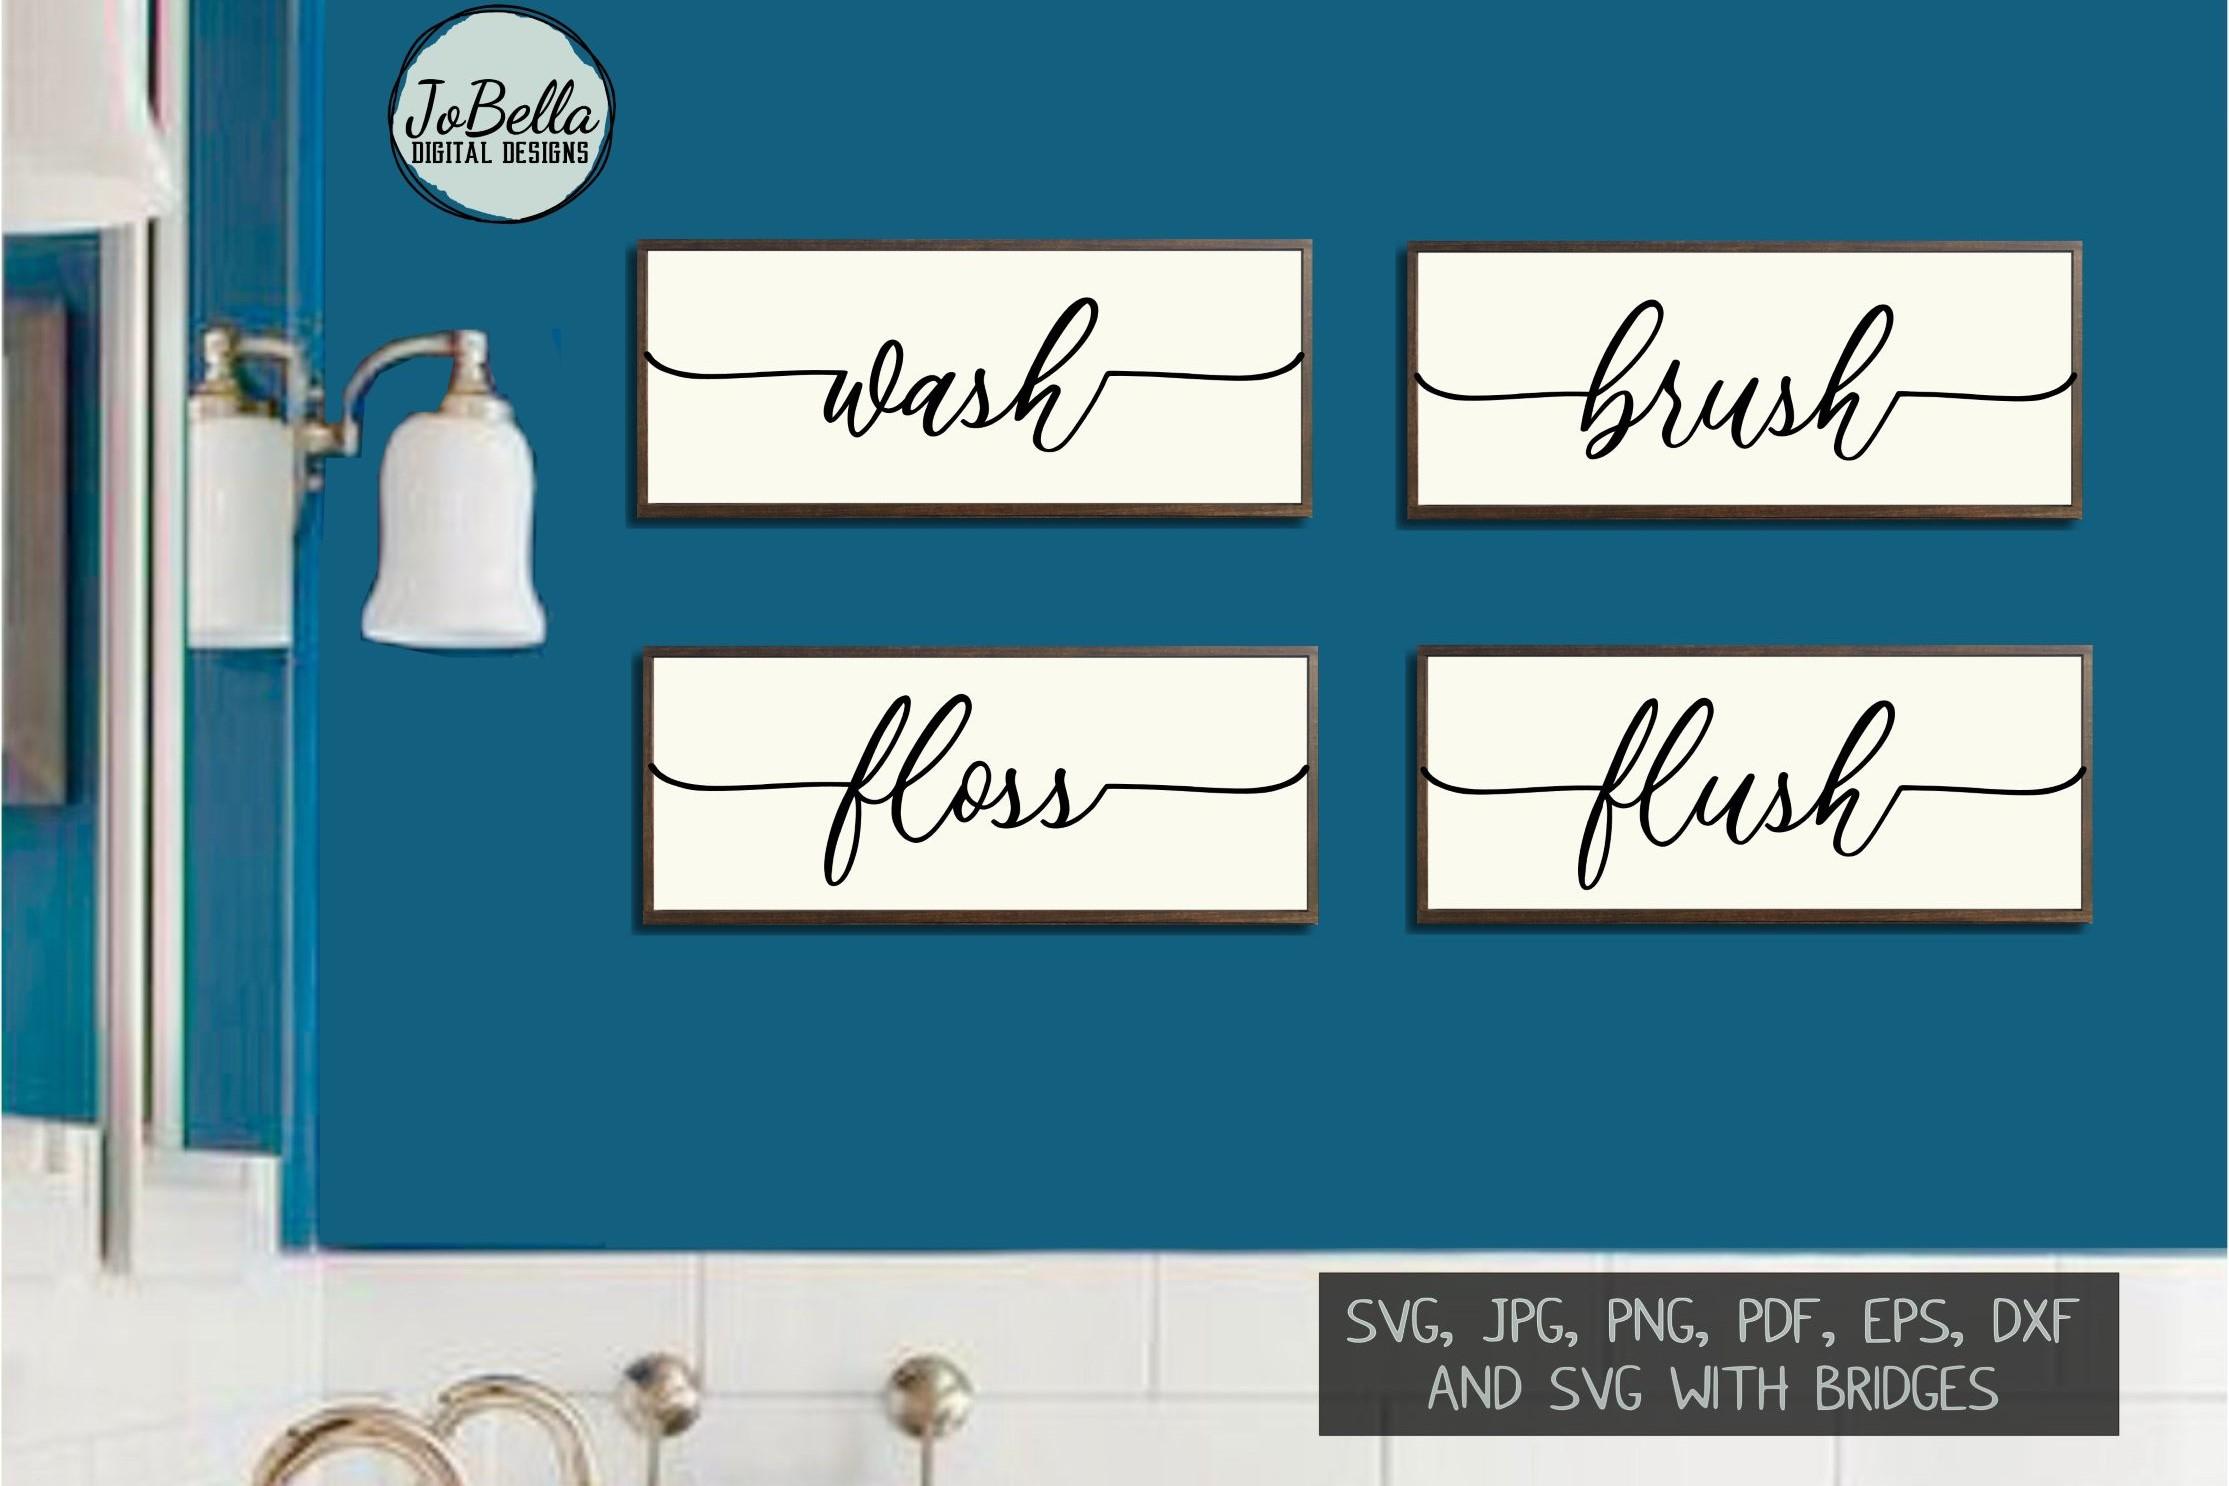 Wash Brush Floss Flush Bathroom SVG and Printable Design example image 1